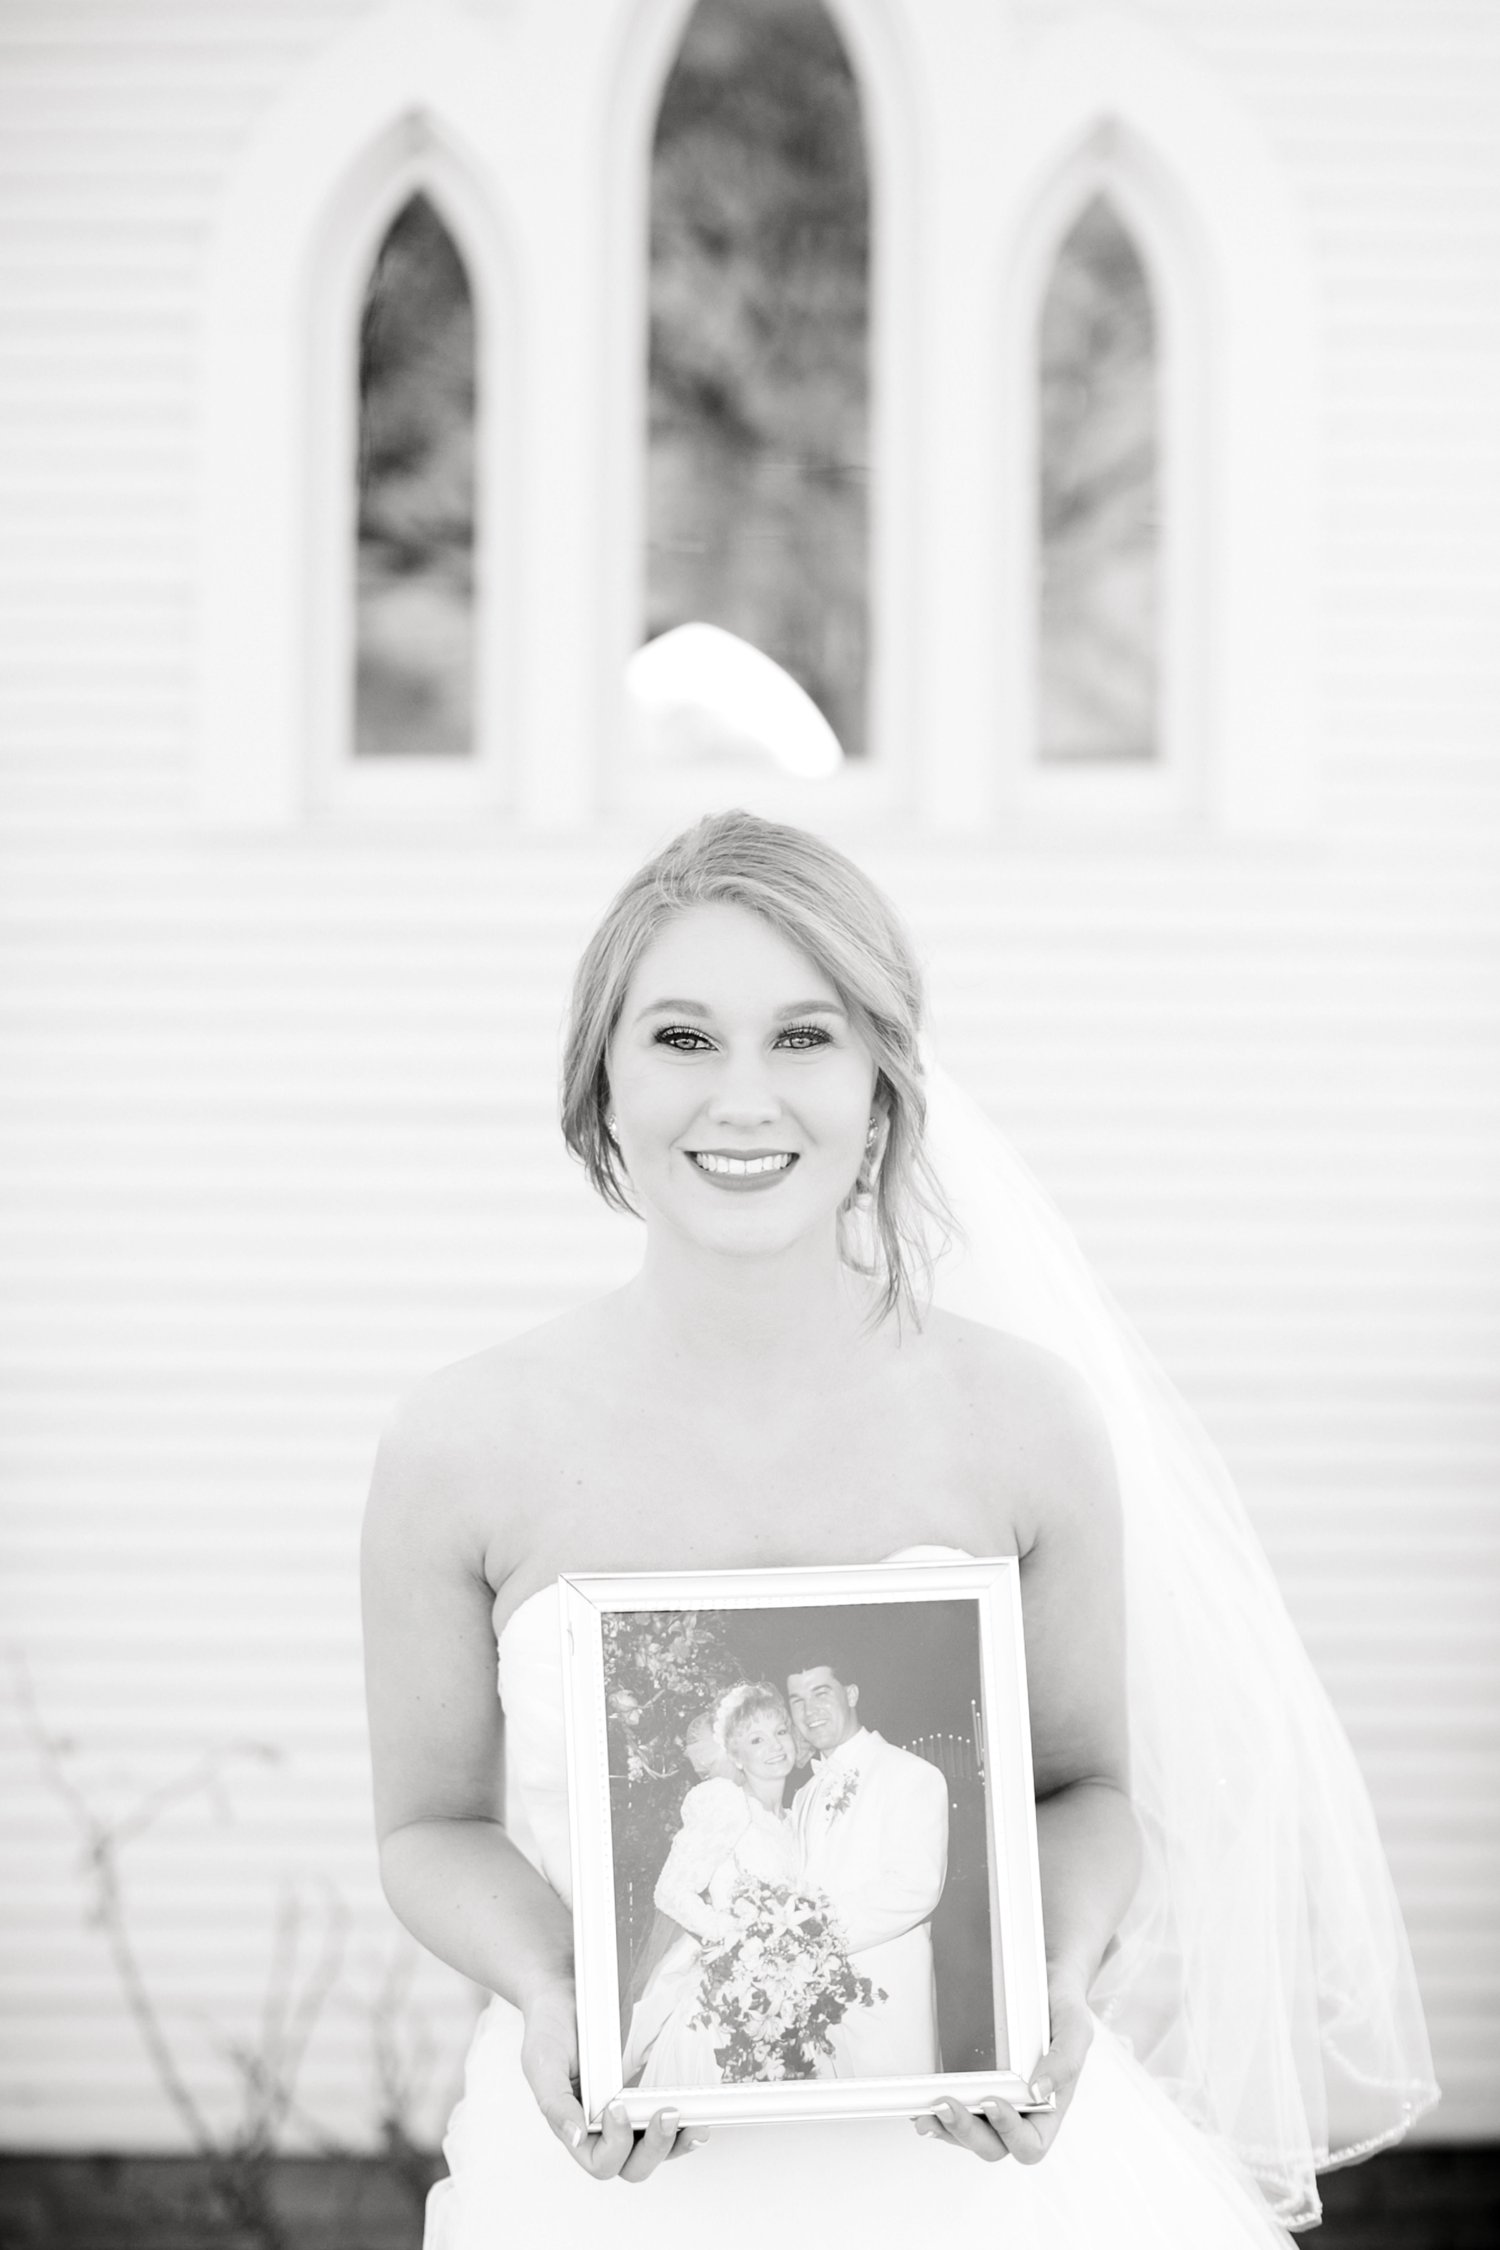 Kaila-cox-bridals-lubbock-photographer0012.jpg